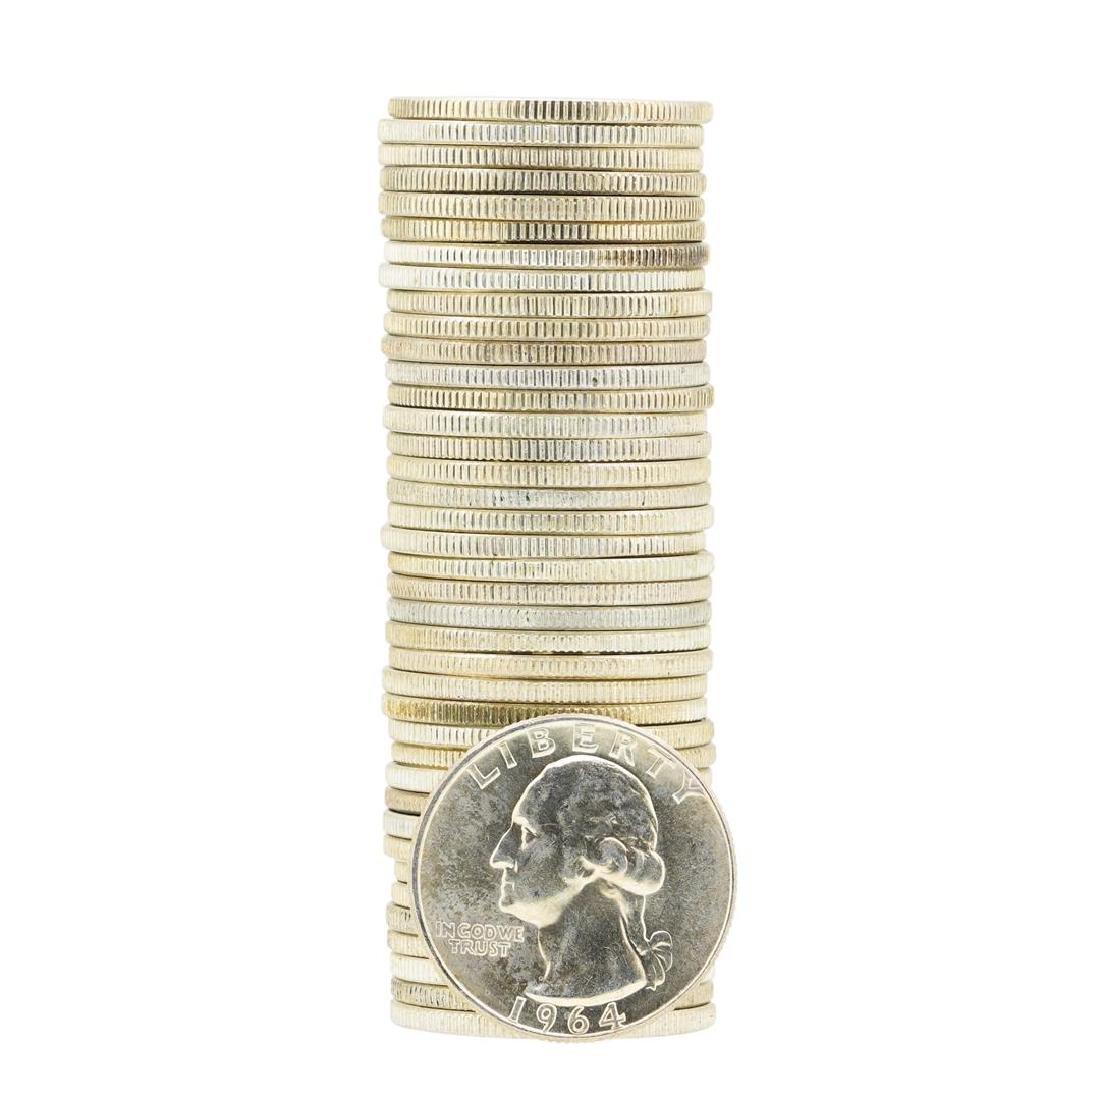 Tube of 40 1964D Washington Quarter Dollars